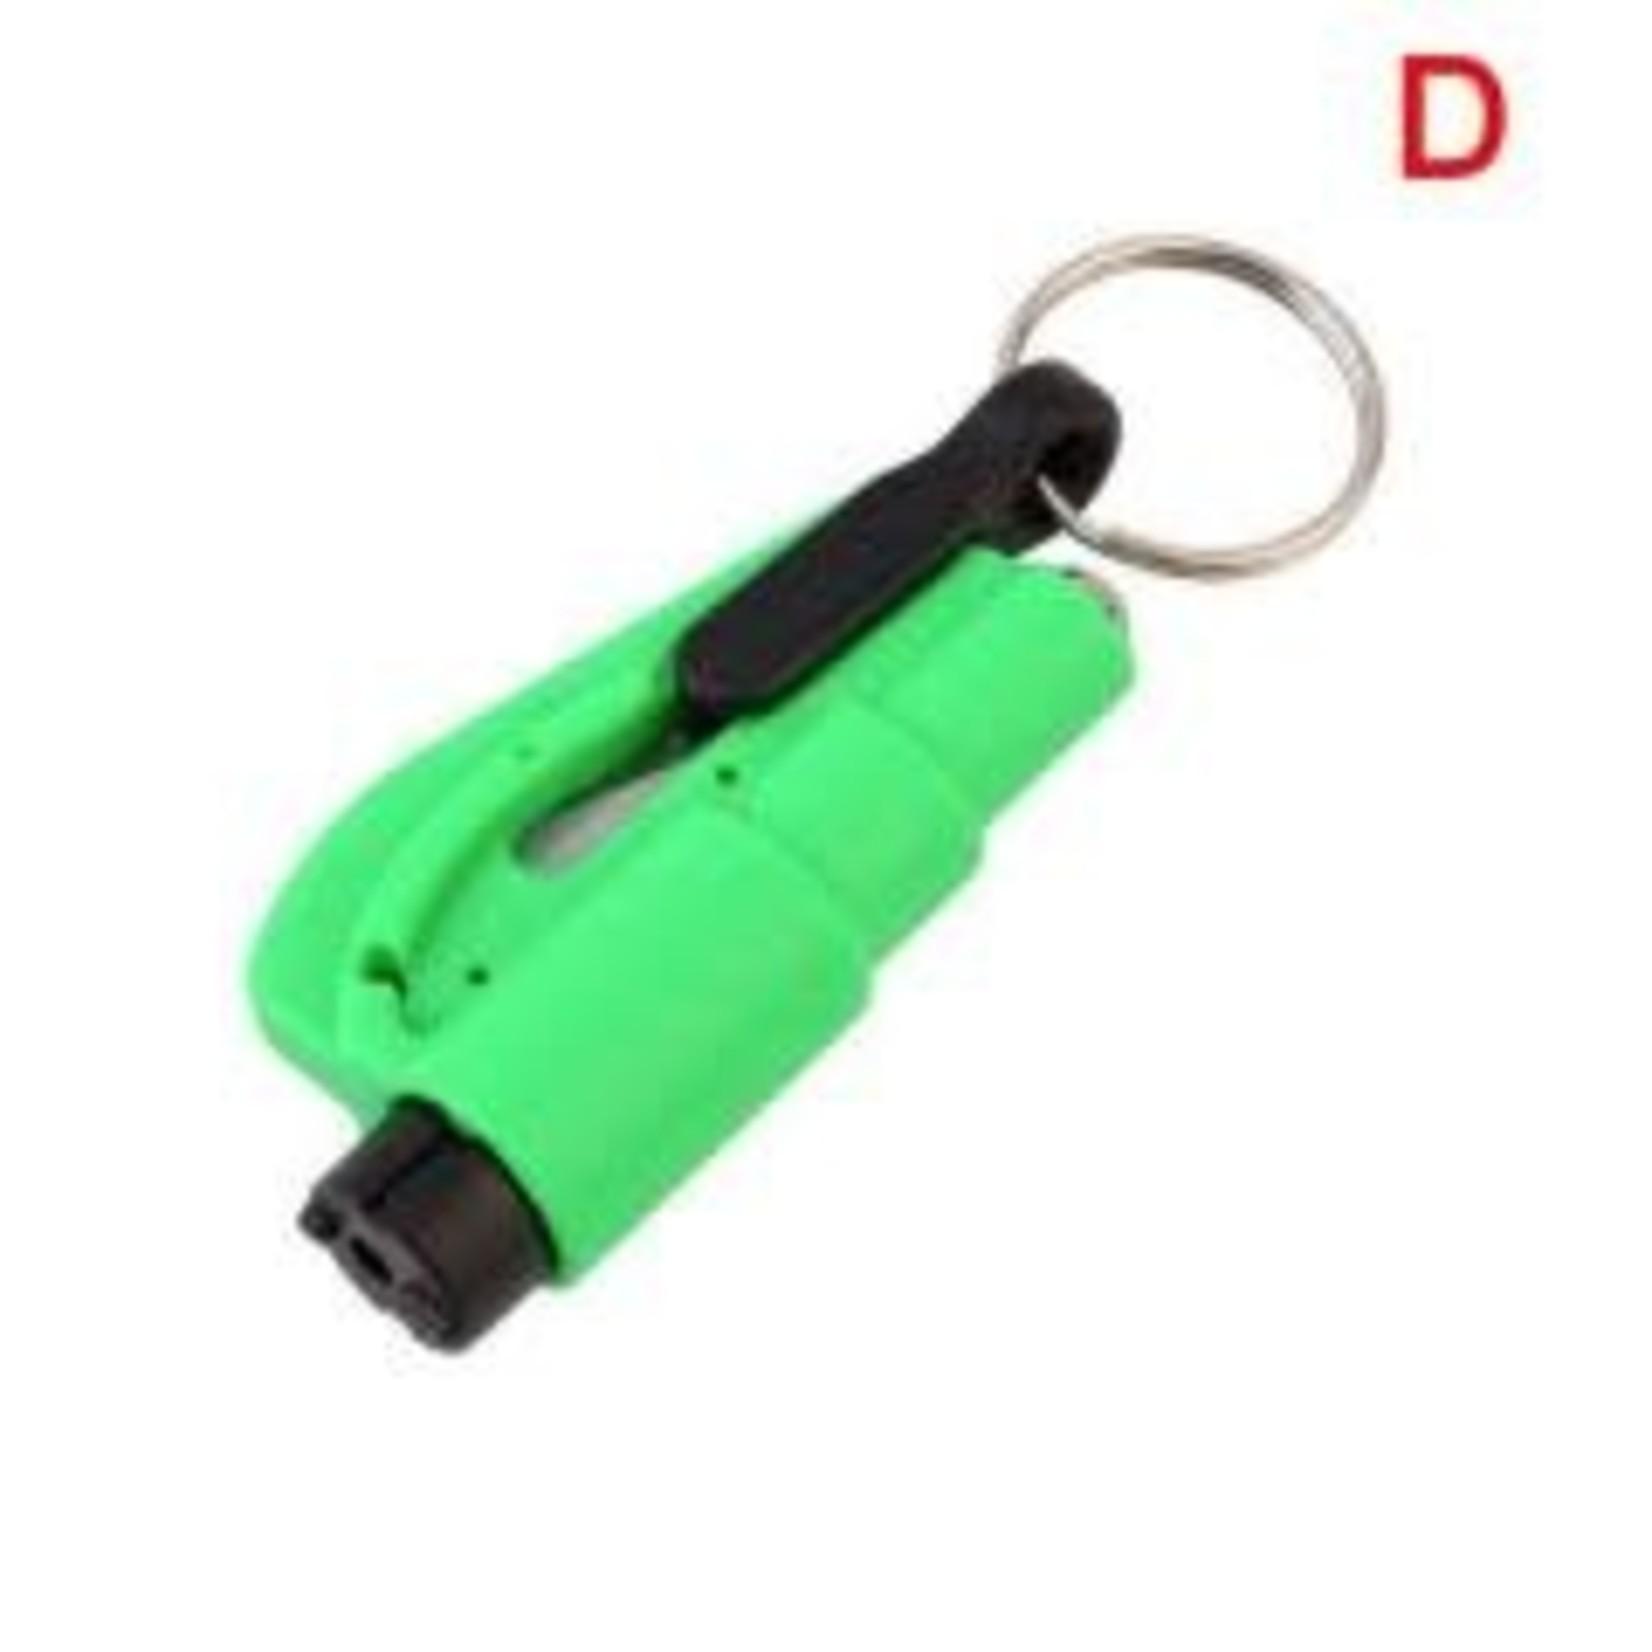 306 Tactical Keychain Car Emergency Rescue